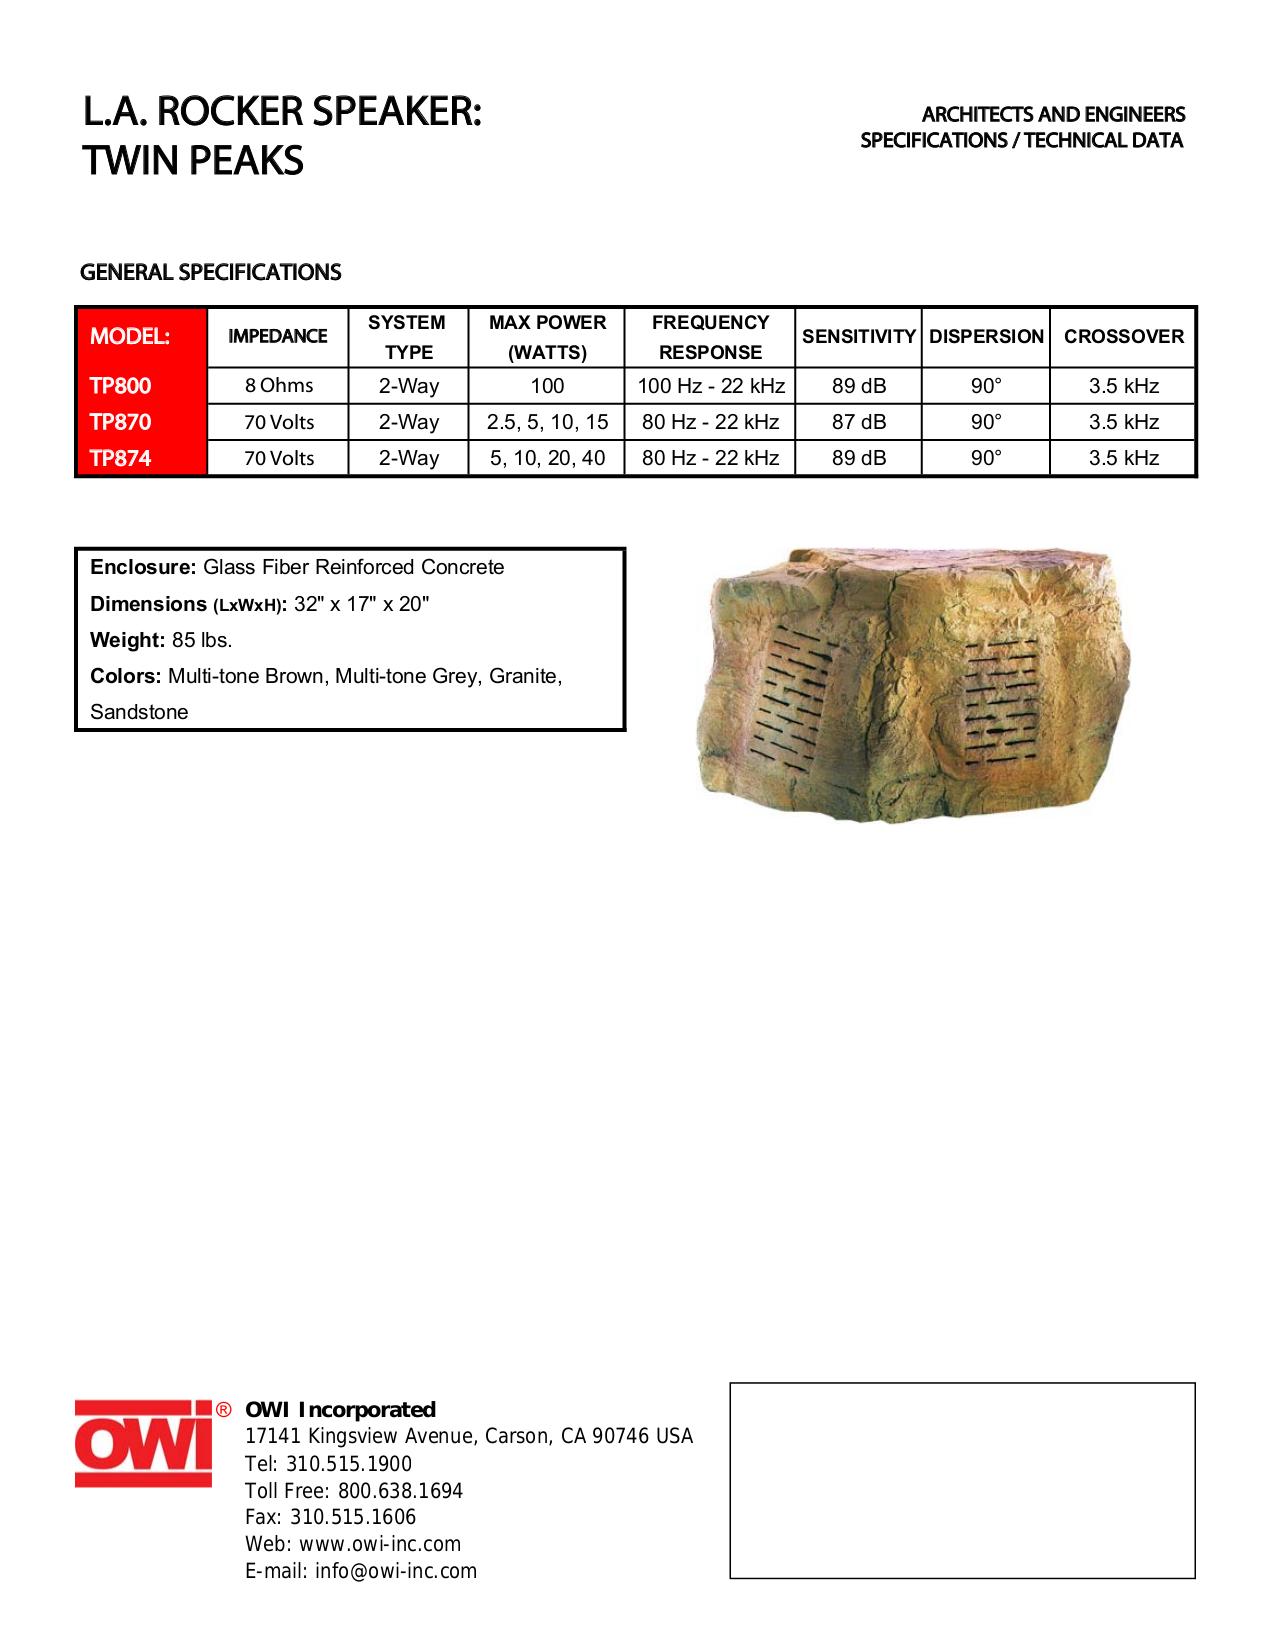 pdf for Owi Speaker TP800 manual